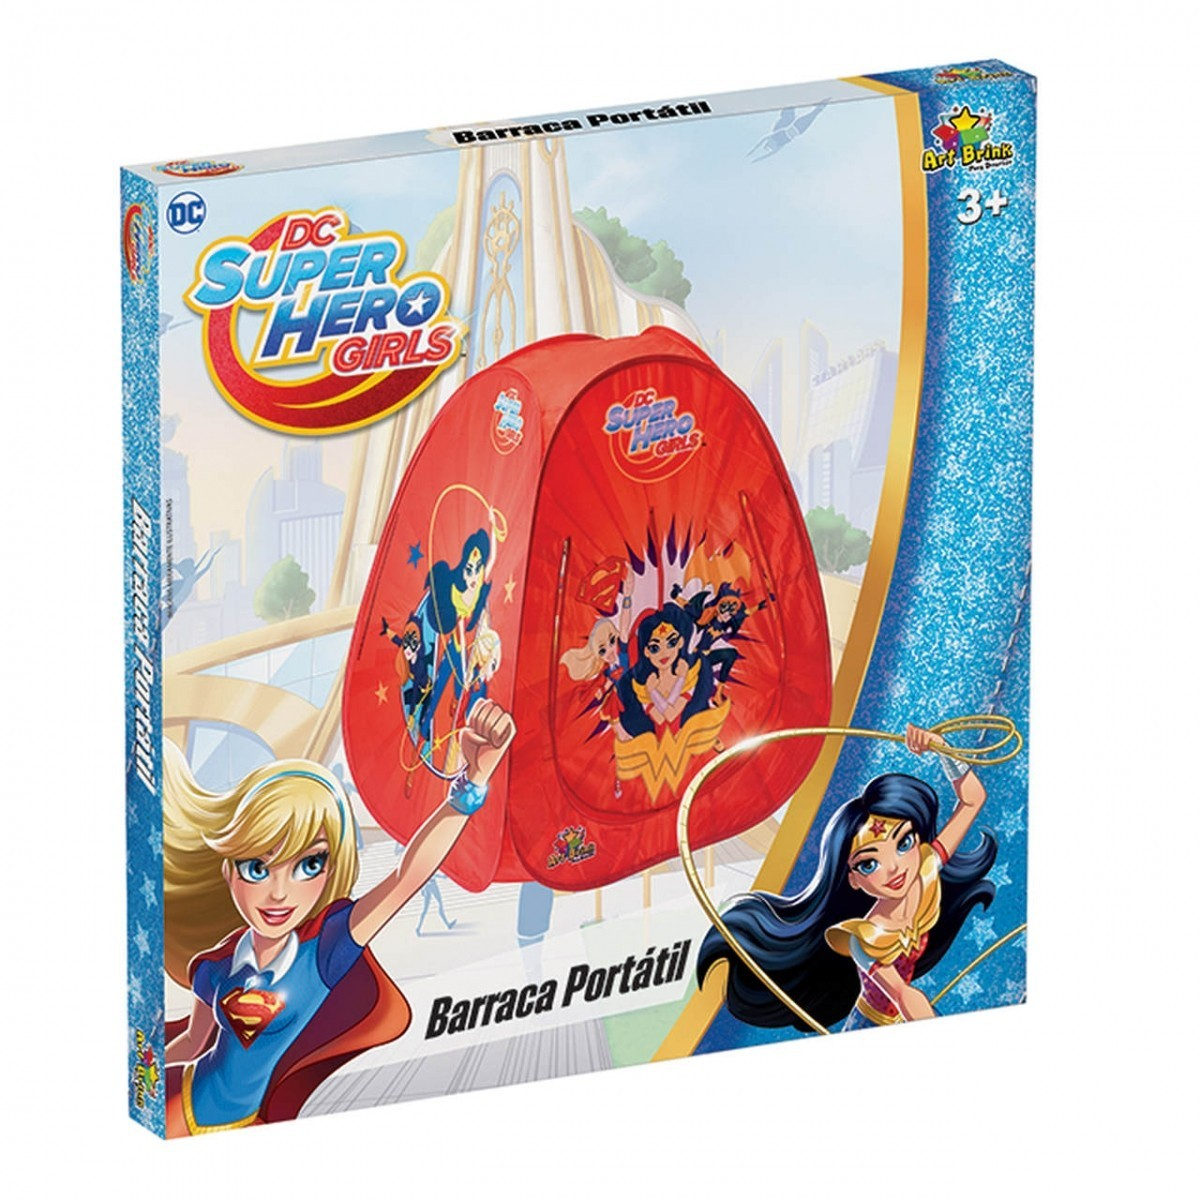 Barraca Portátil Dc Super Hero Girls